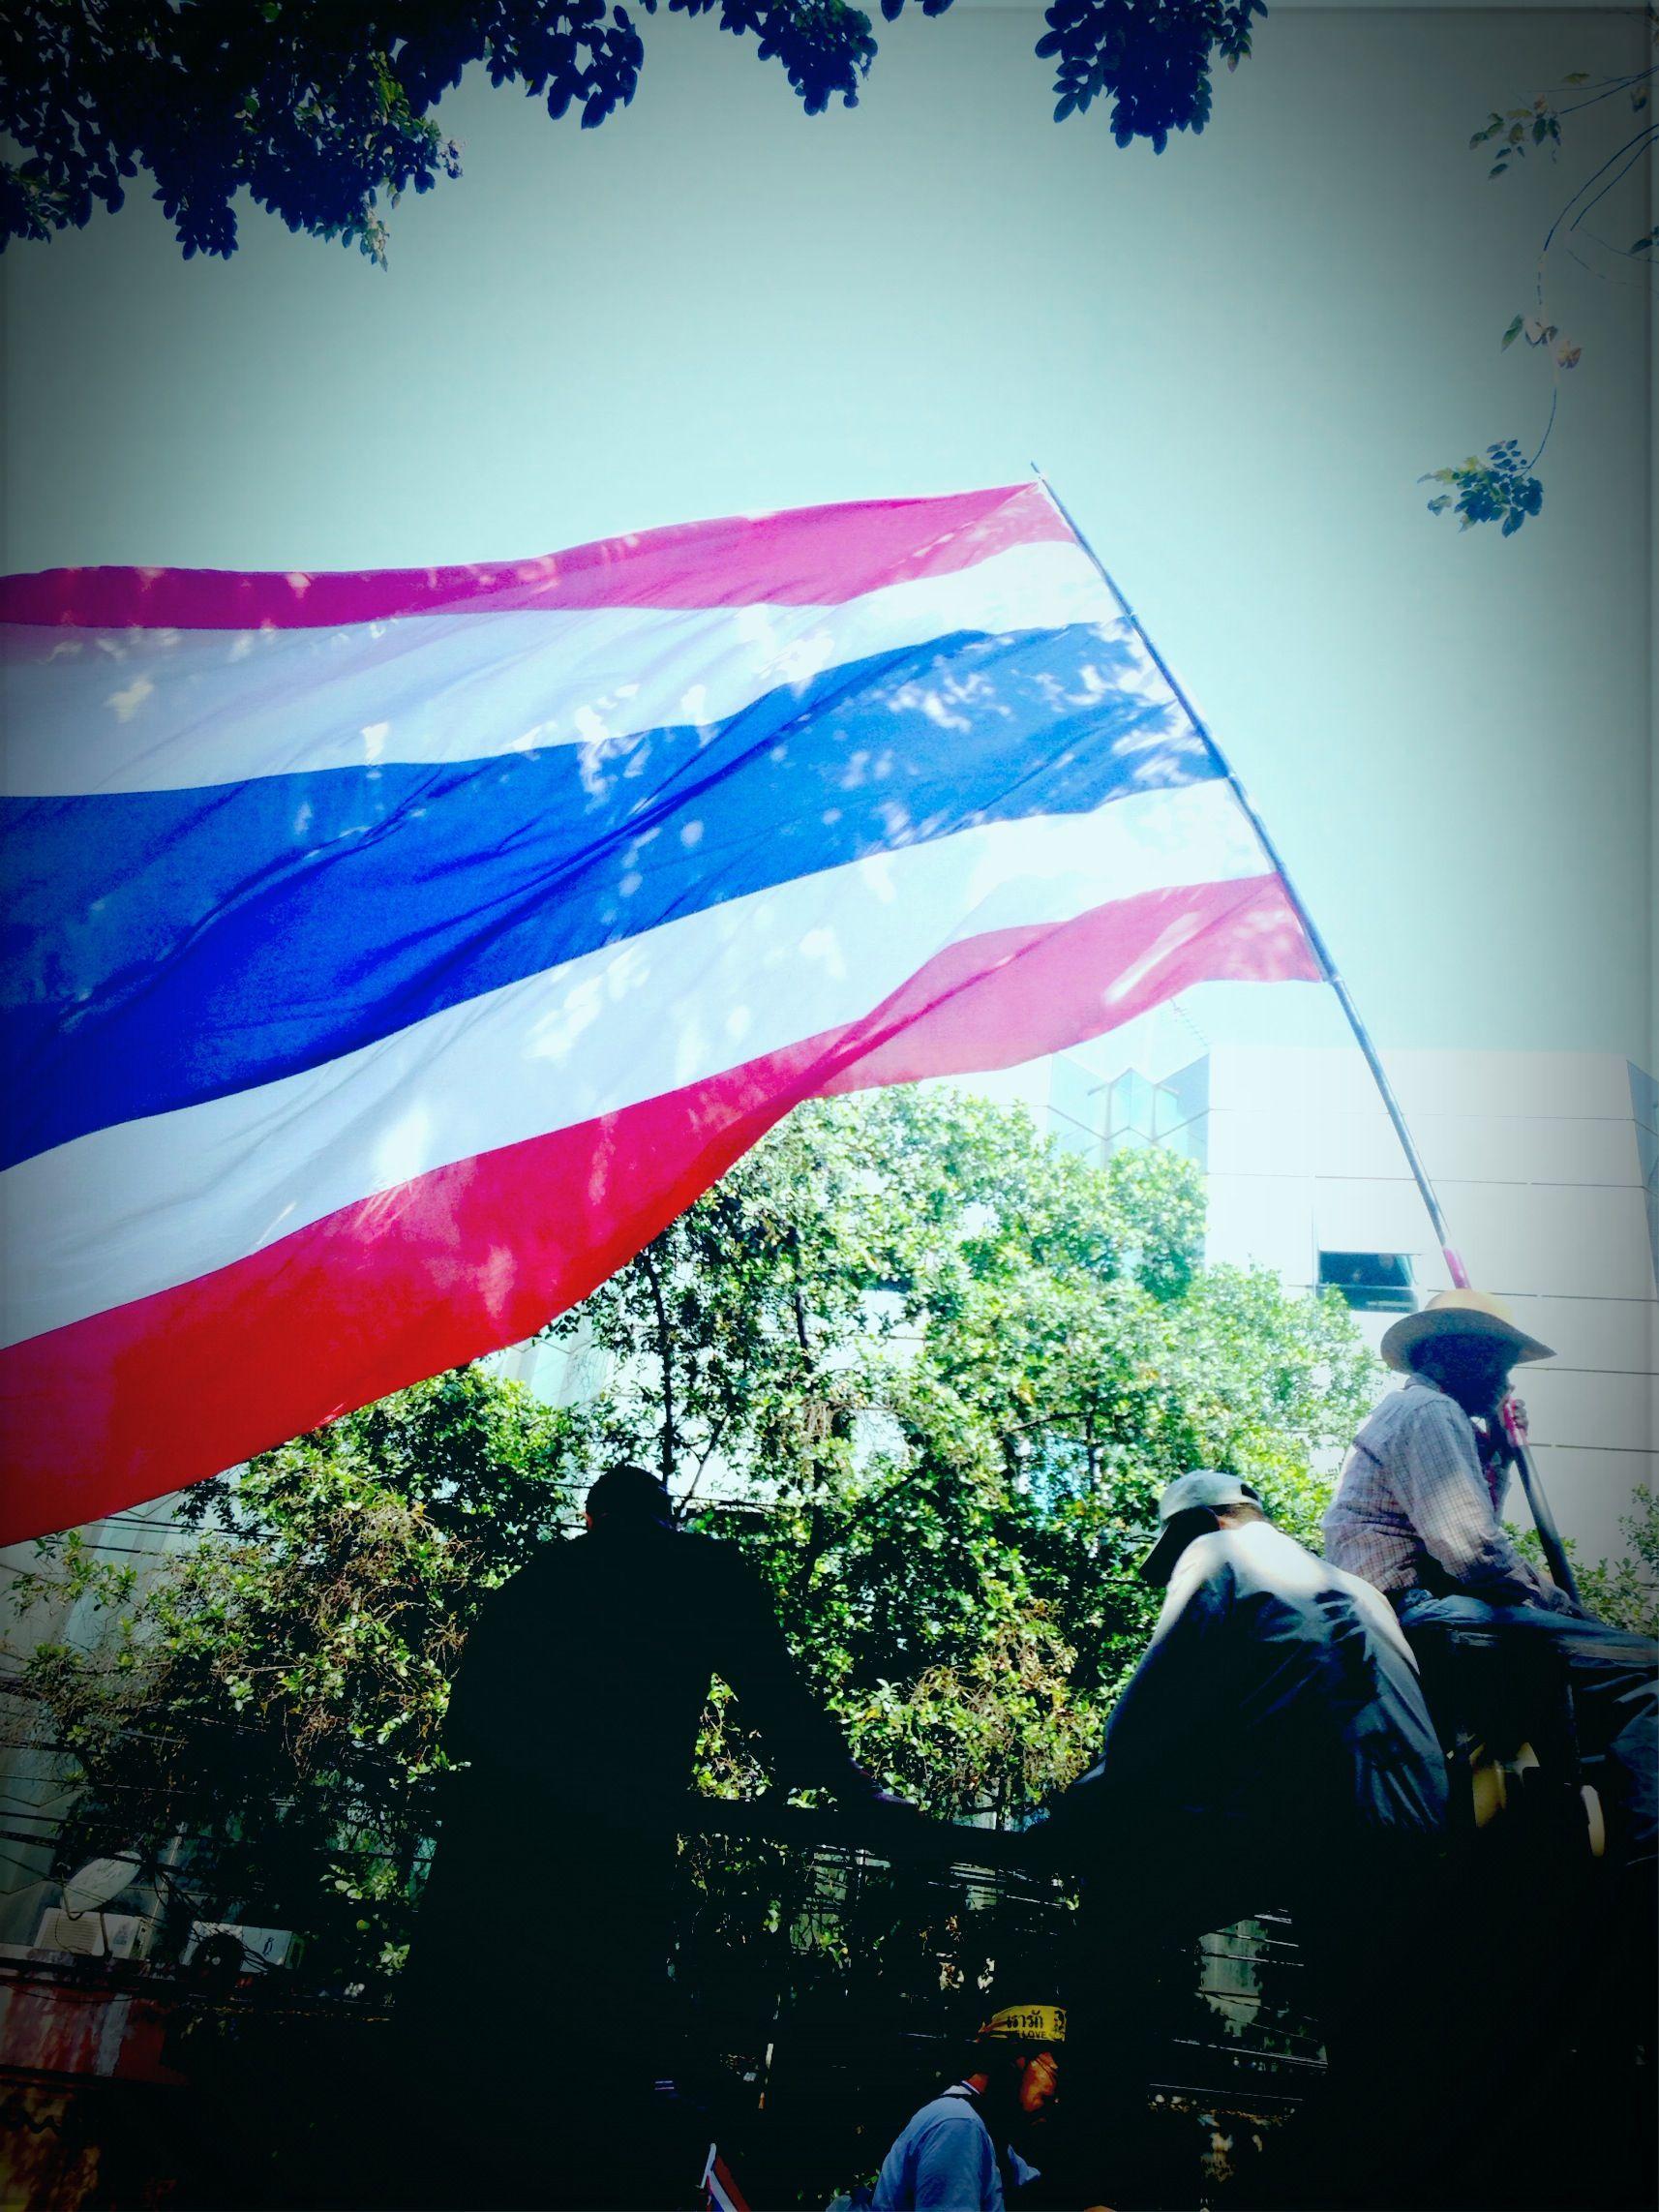 thaiuprising | Thai national flag! | Pinterest | National flag